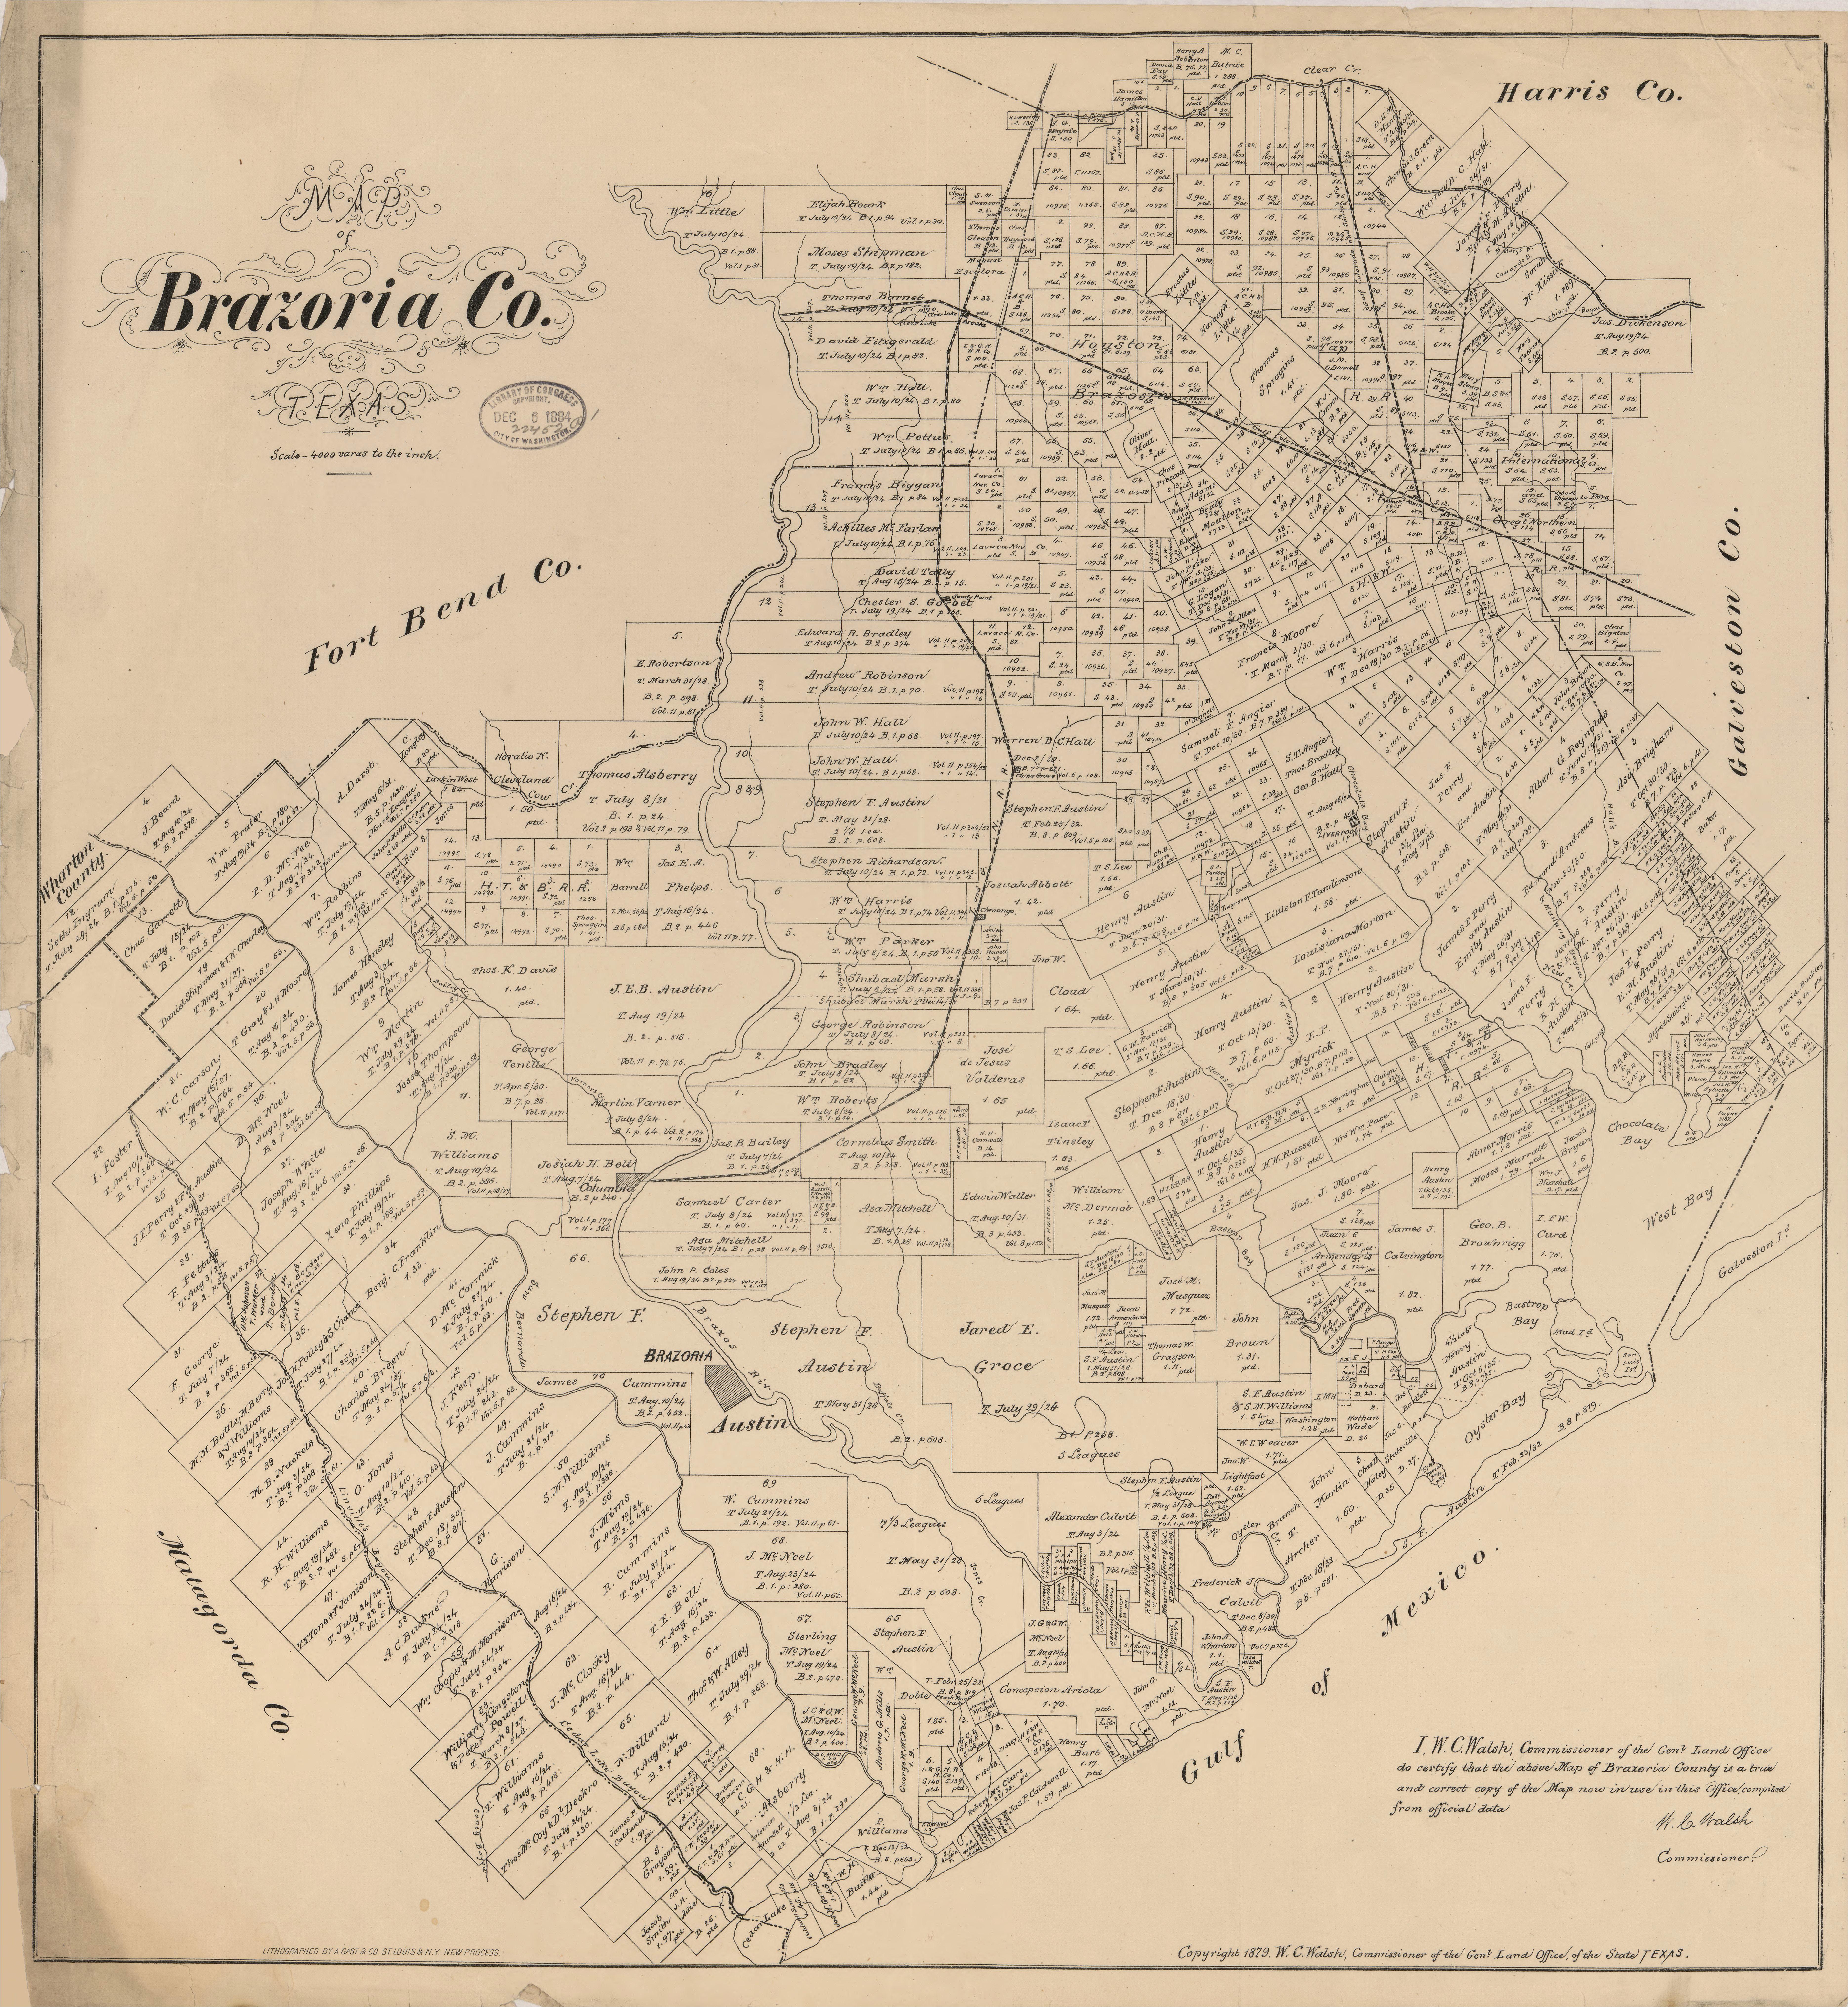 file map of brazoria co texas loc 2012592011 jpg wikimedia commons